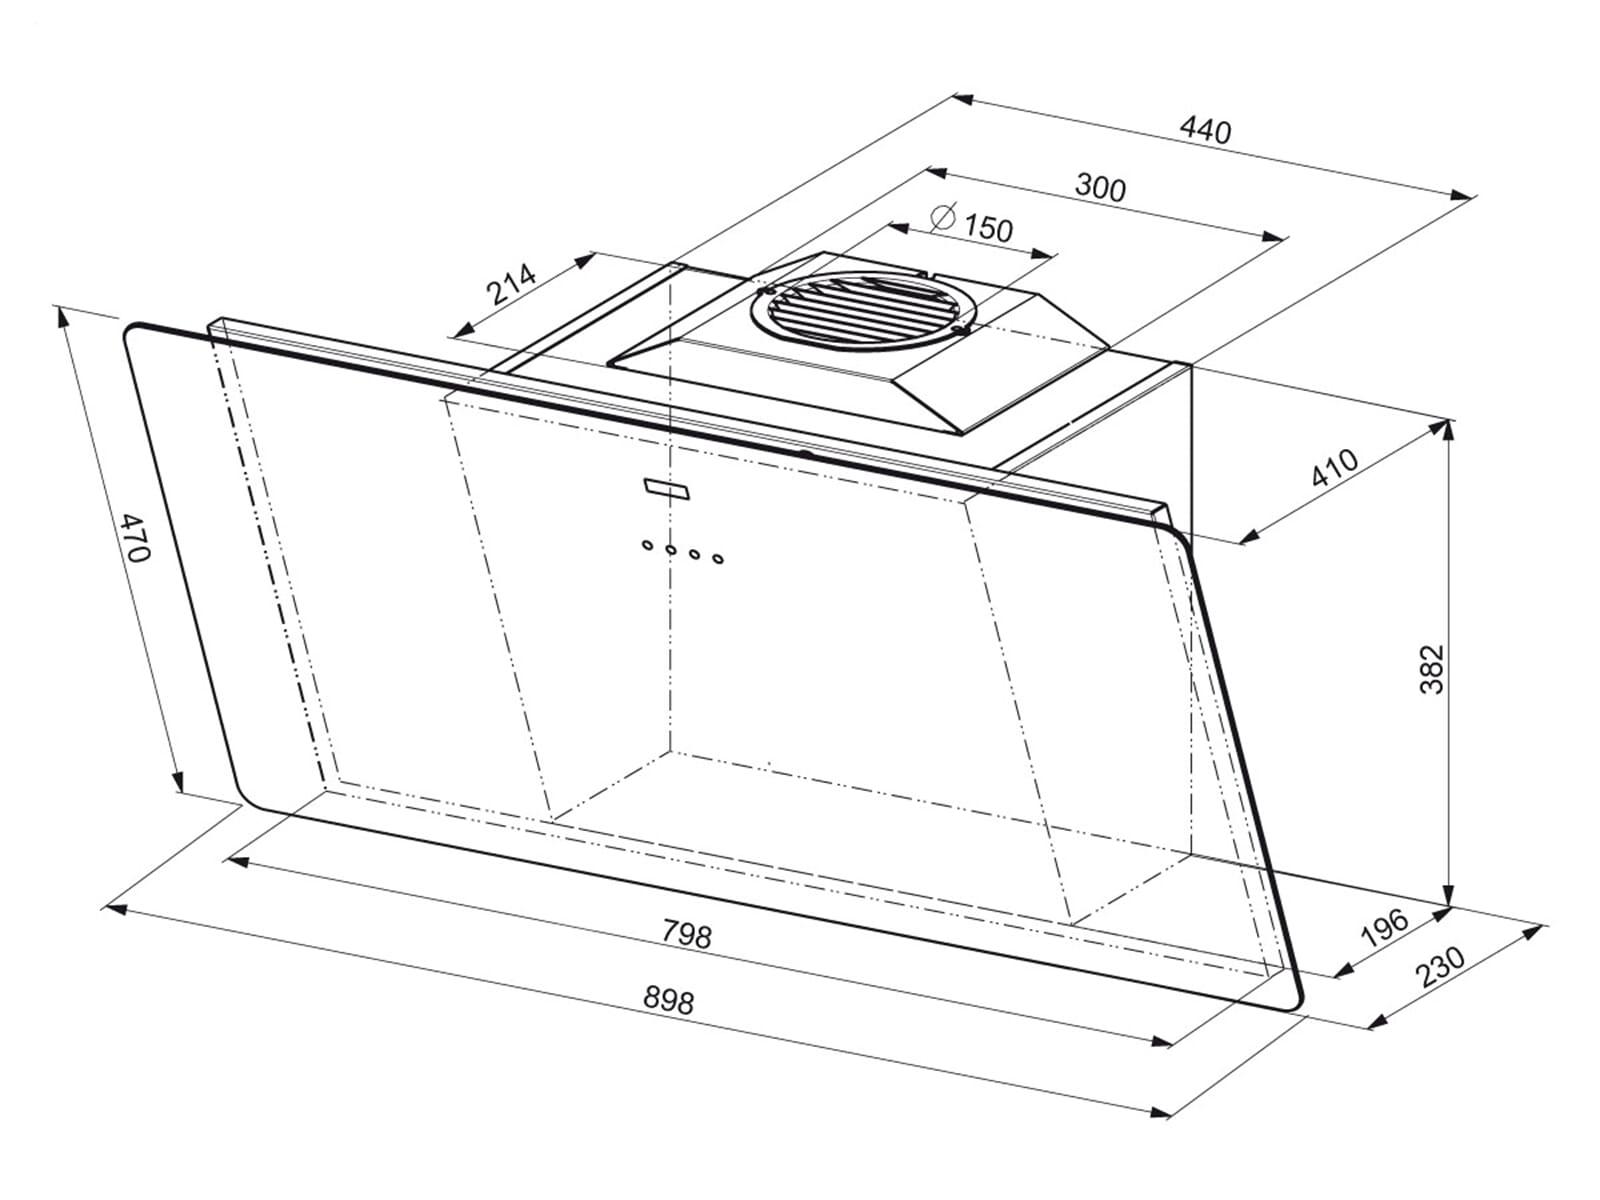 franke smart fsma 905 bk kopffreihaube schwarz. Black Bedroom Furniture Sets. Home Design Ideas